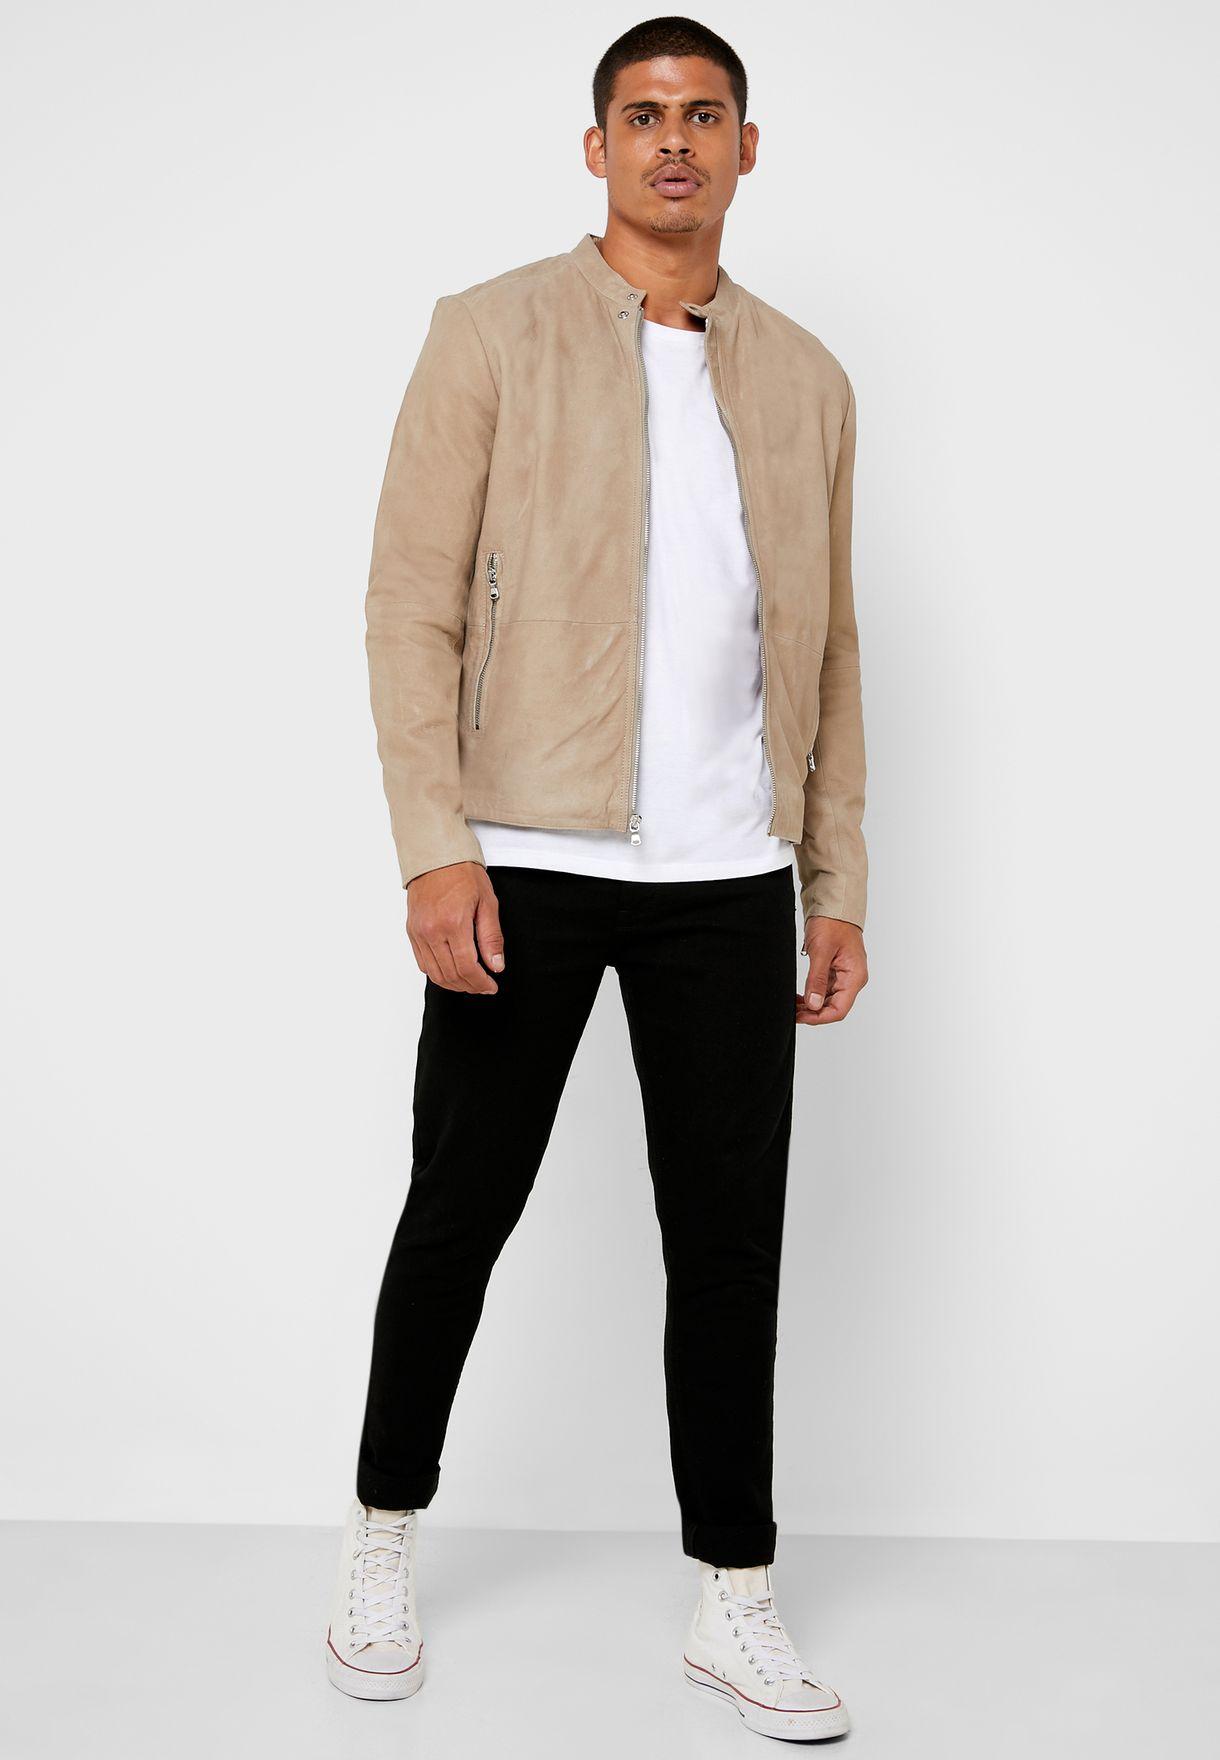 John Varvatos Hayden Biker Jacket - Fashion